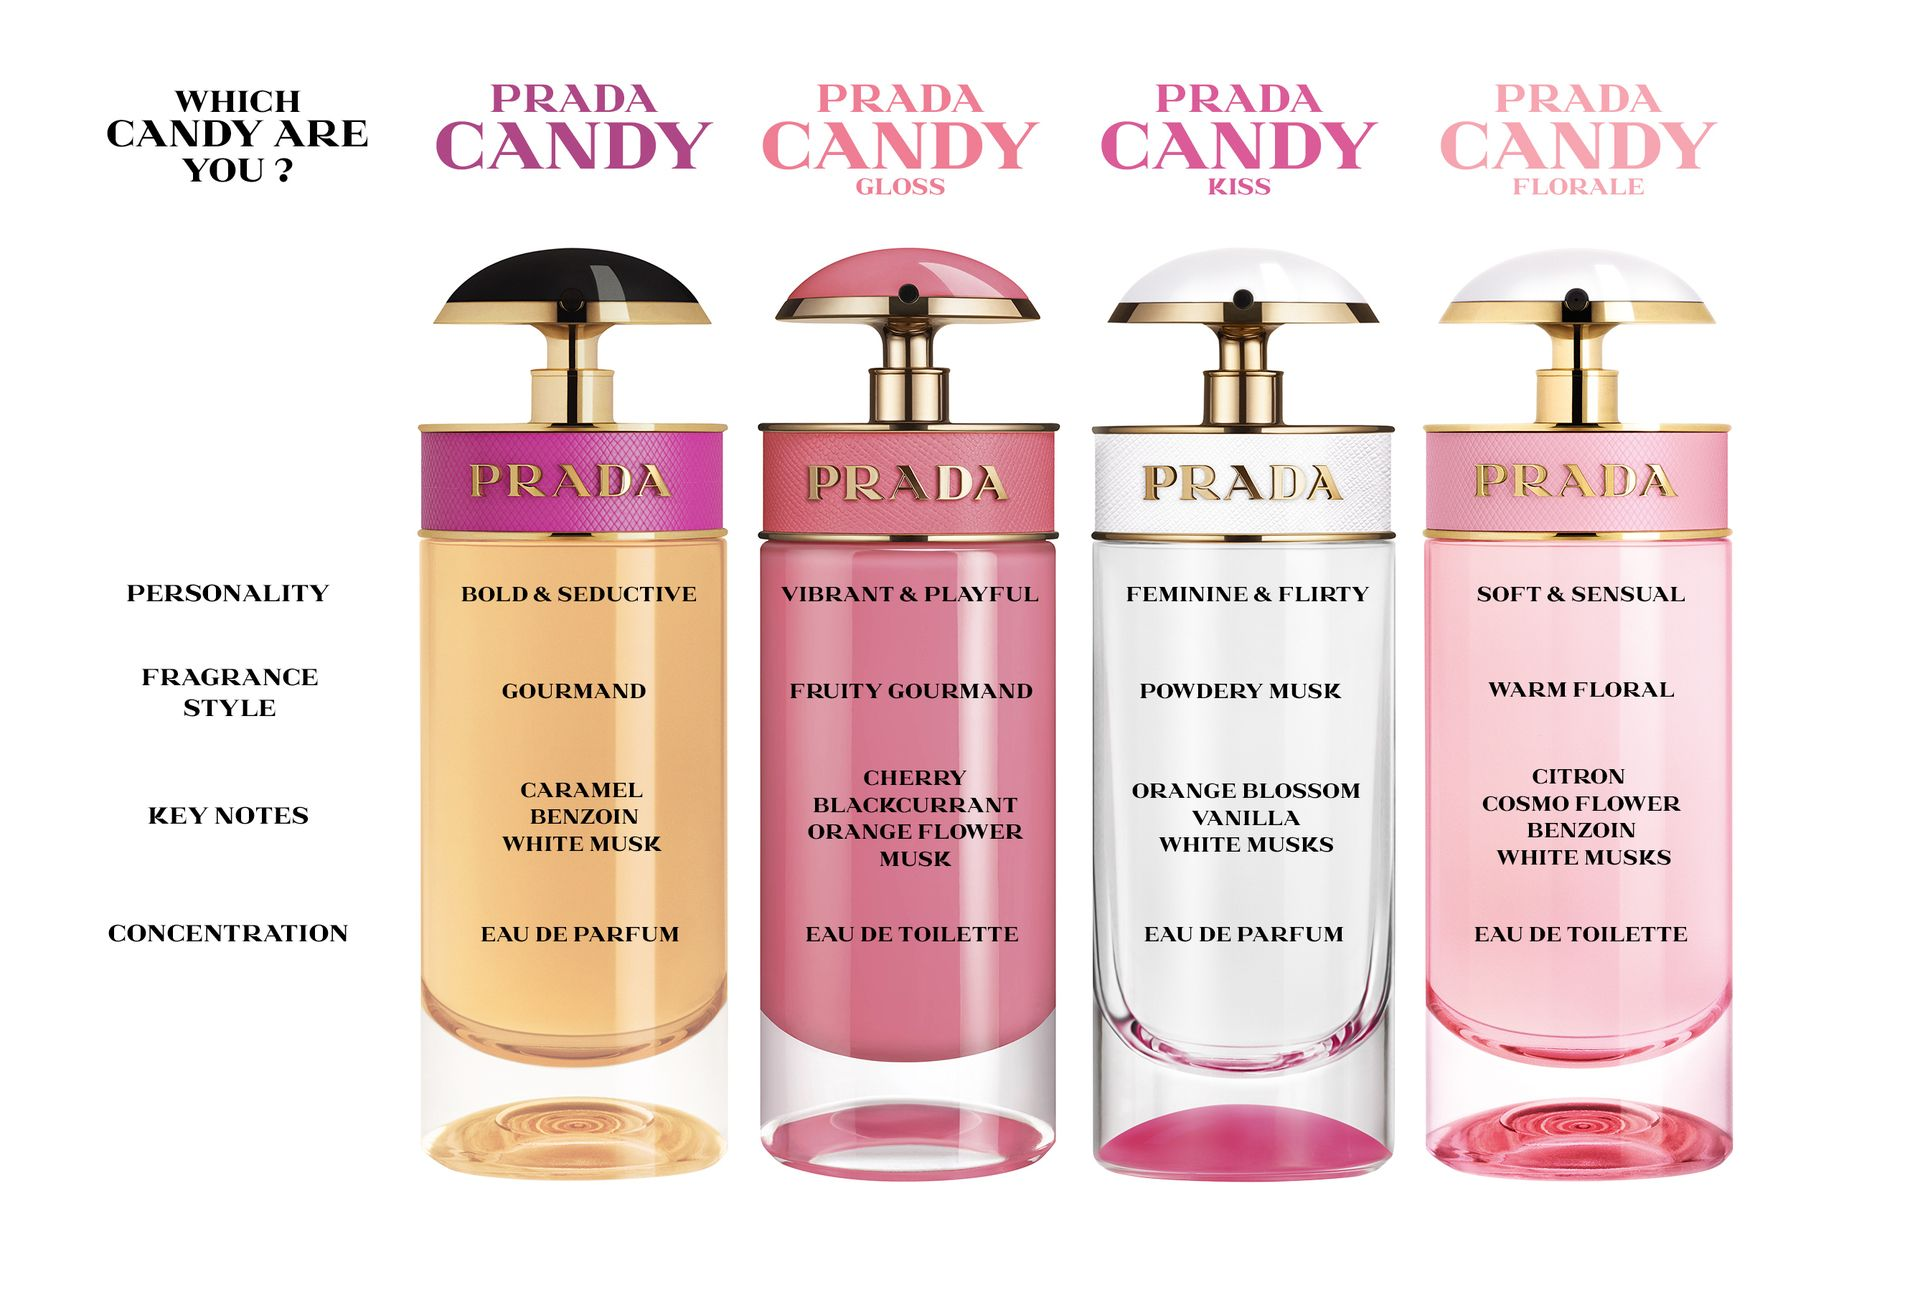 Prada Candy Eau de Parfum | Ulta Beauty | Perfume scents, Candy perfume, Prada  candy perfume